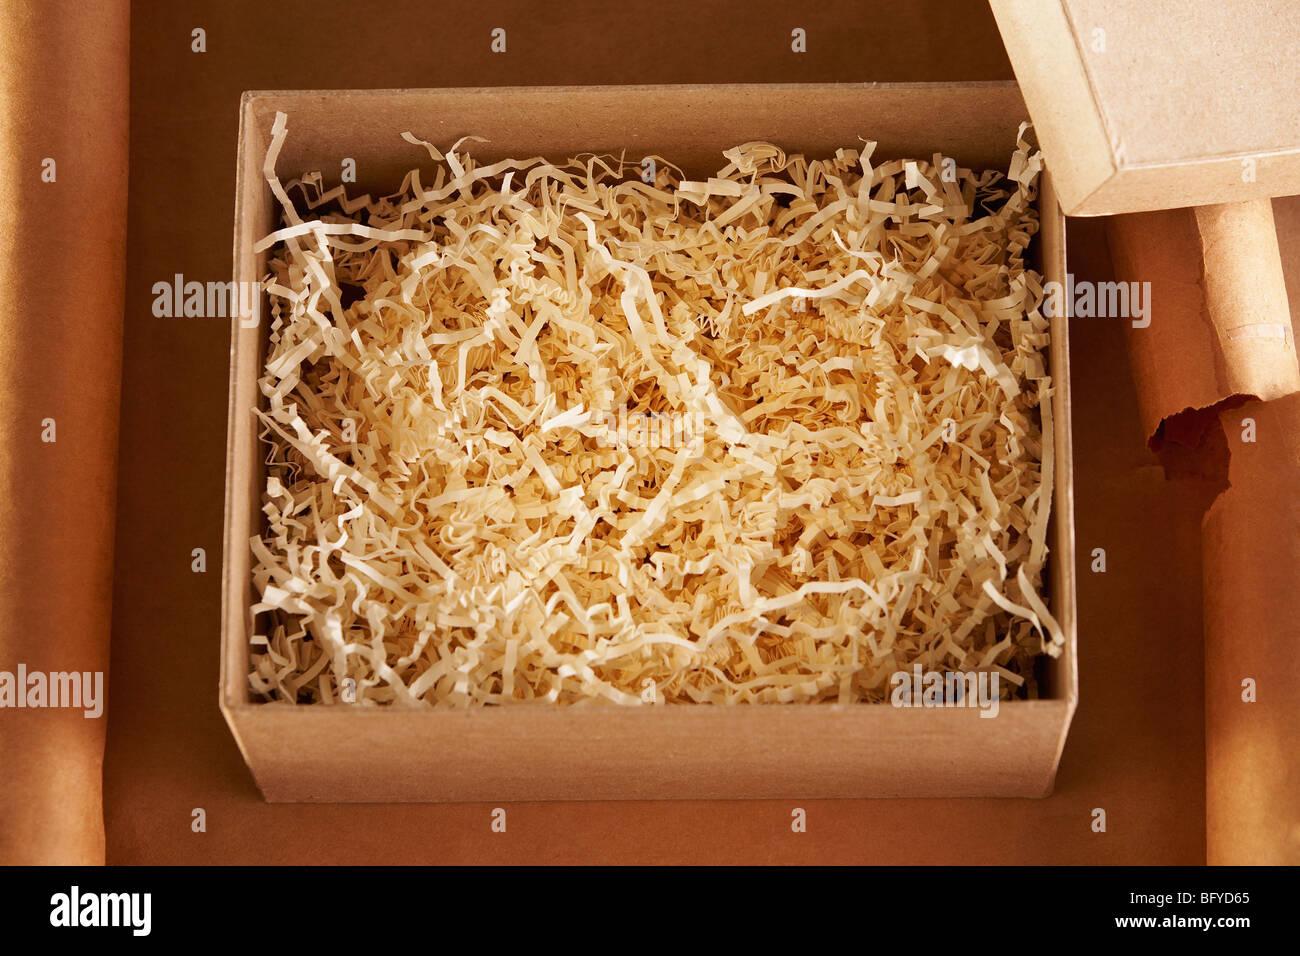 Vista aérea de una caja de cartón vacía Foto de stock